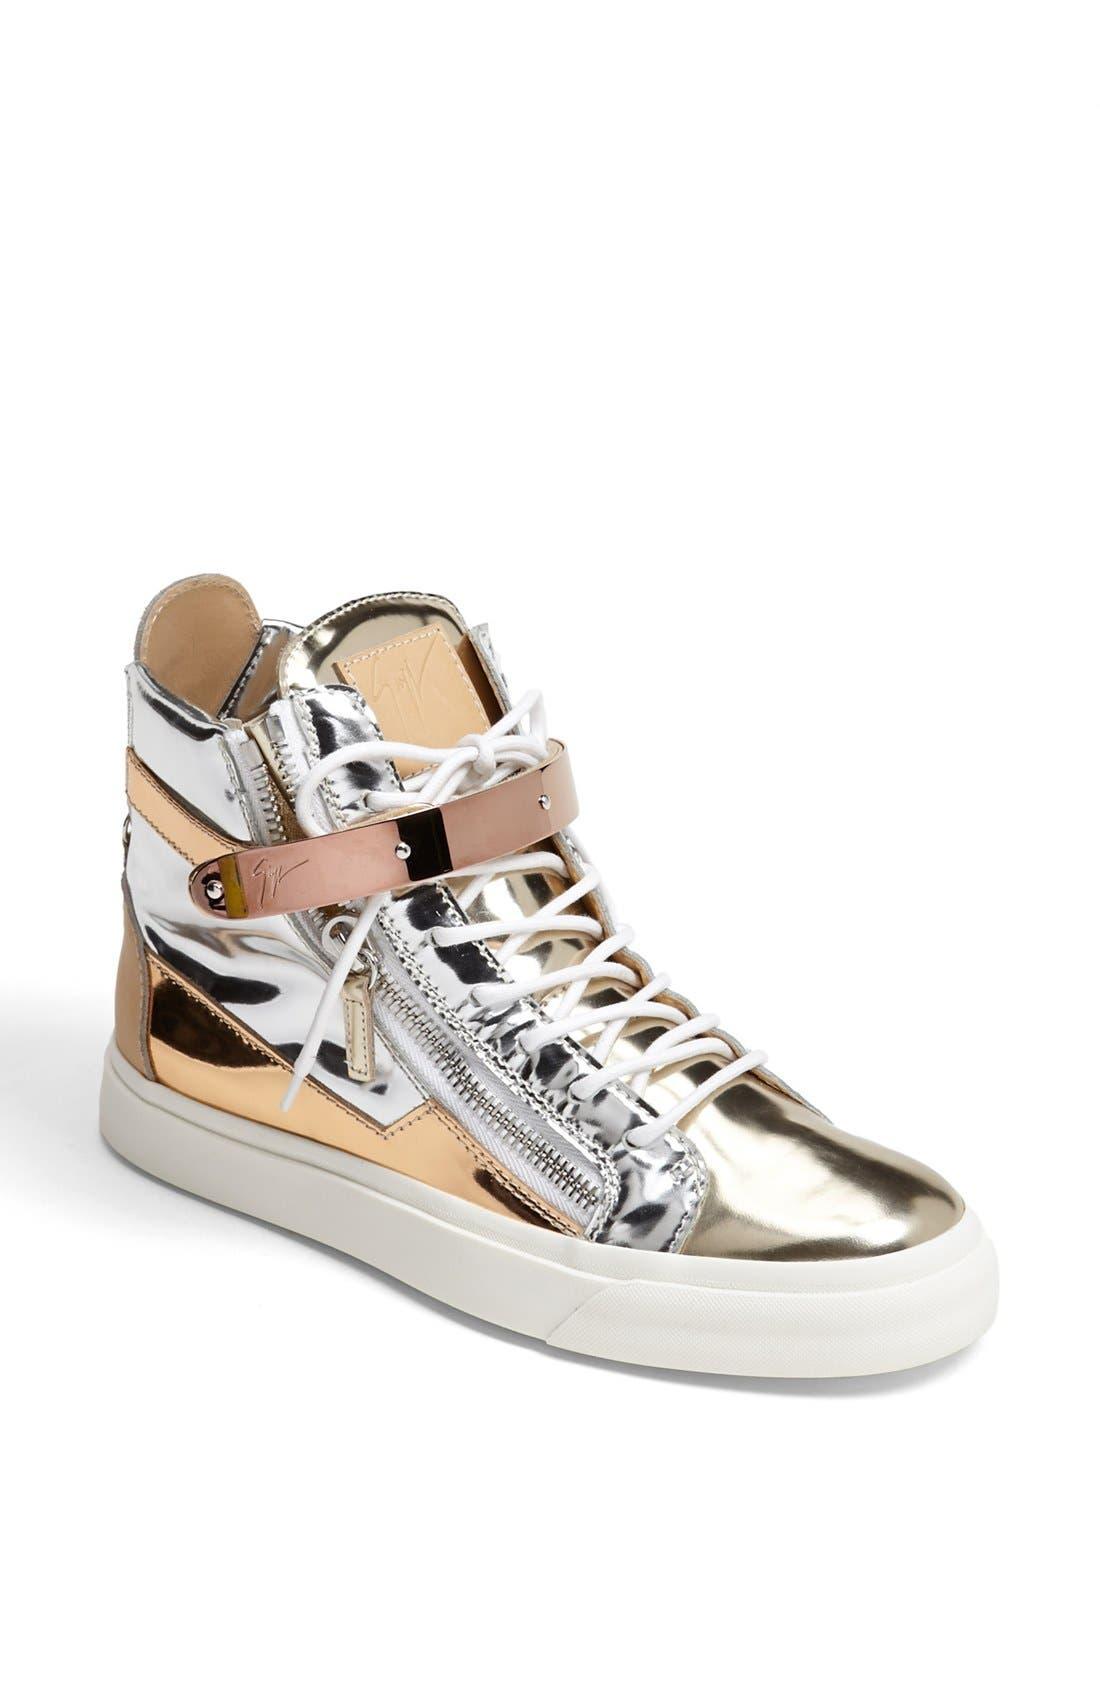 Alternate Image 1 Selected - Giuseppe Zanotti 'London' High Top Wedge Sneaker